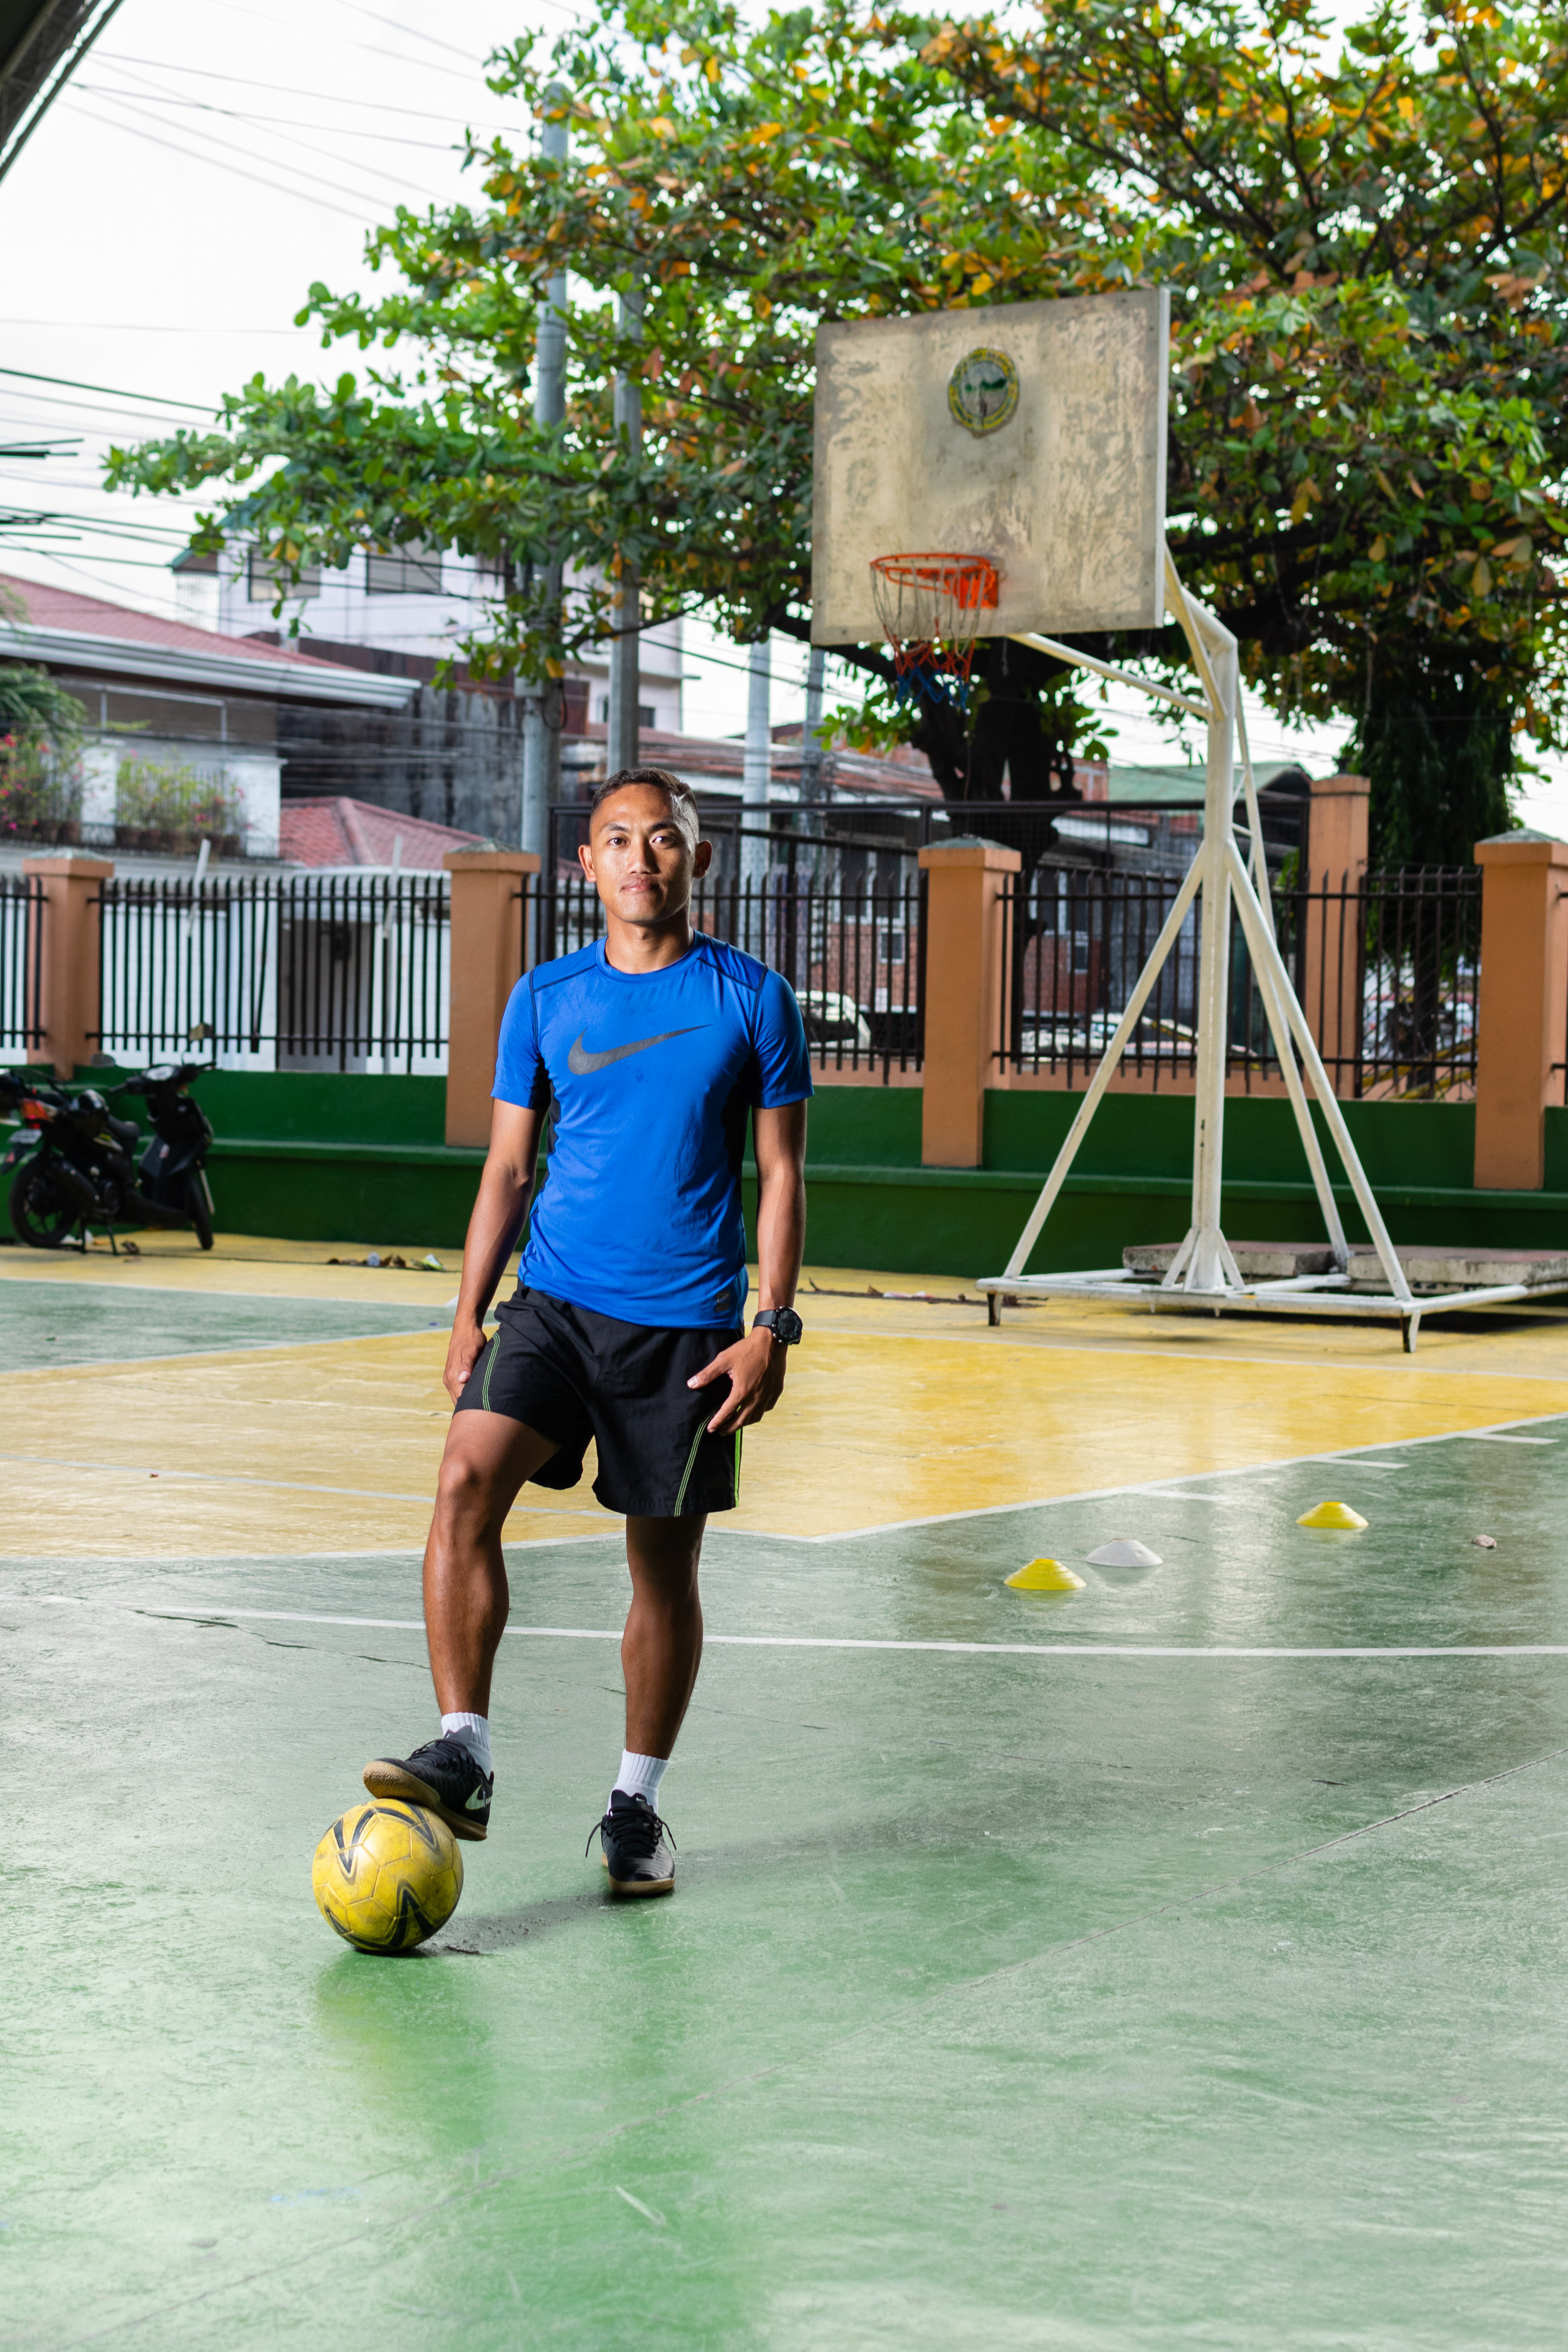 190312_Basketball_Portrait-4.jpg